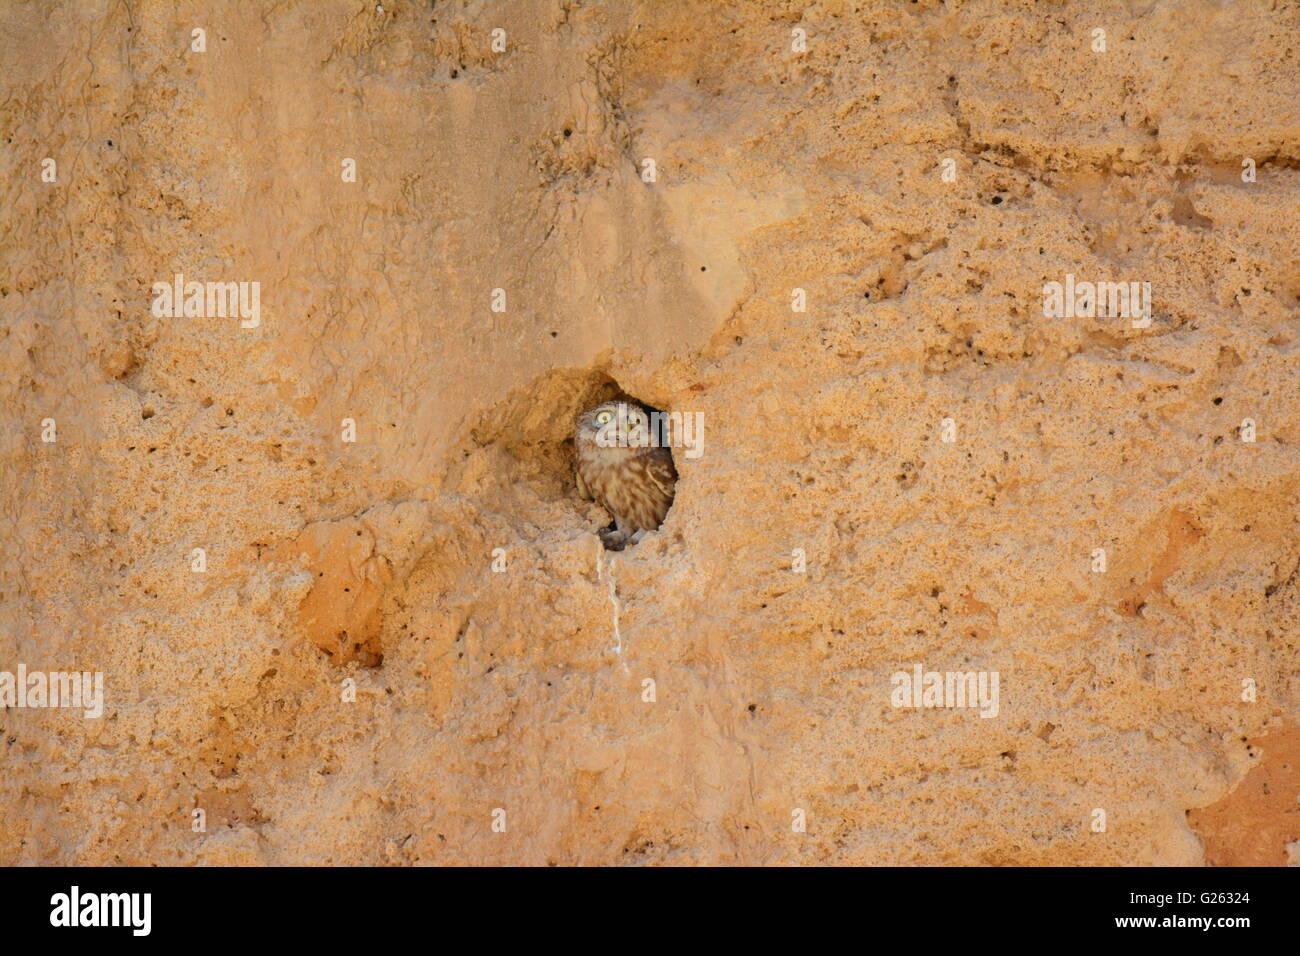 Steinkauz, Athene Noctua Kommissionierung aus Burrow Stockfoto